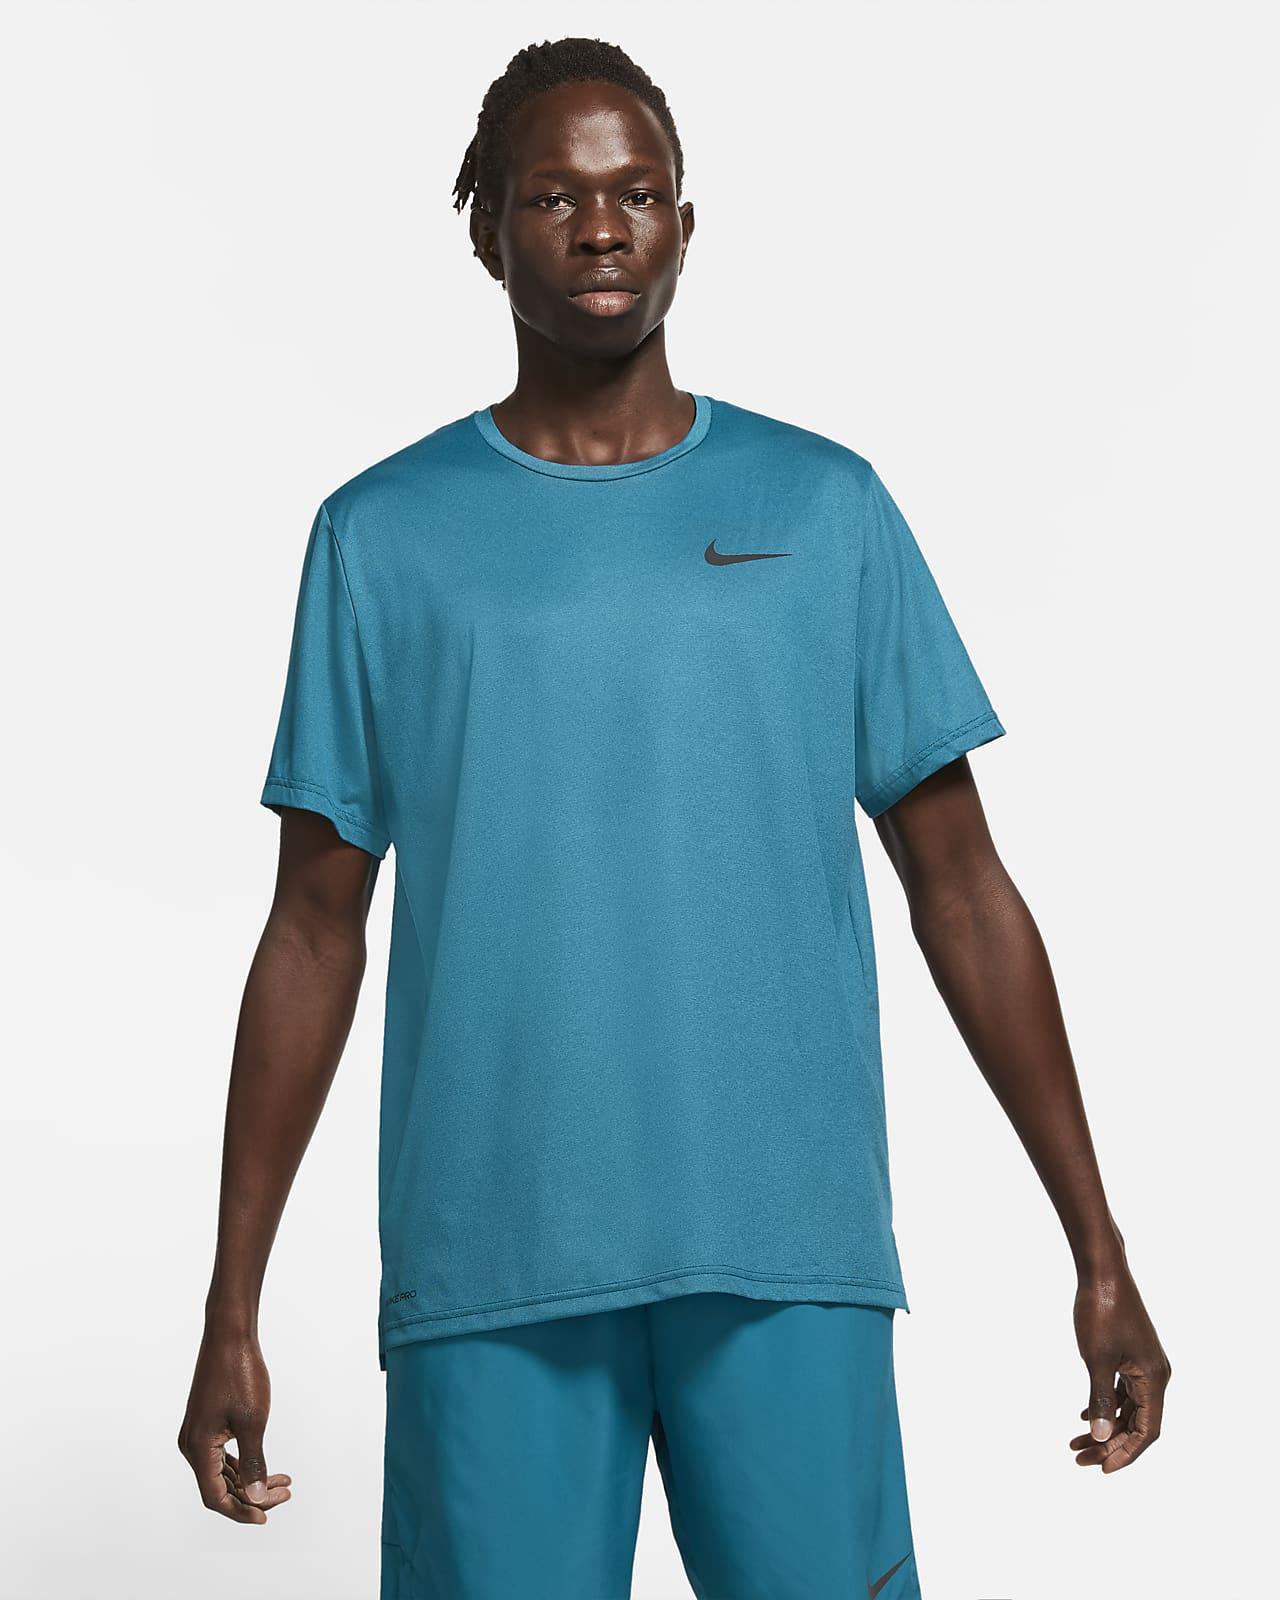 Camisola de manga curta Nike Pro Dri-FIT para homem